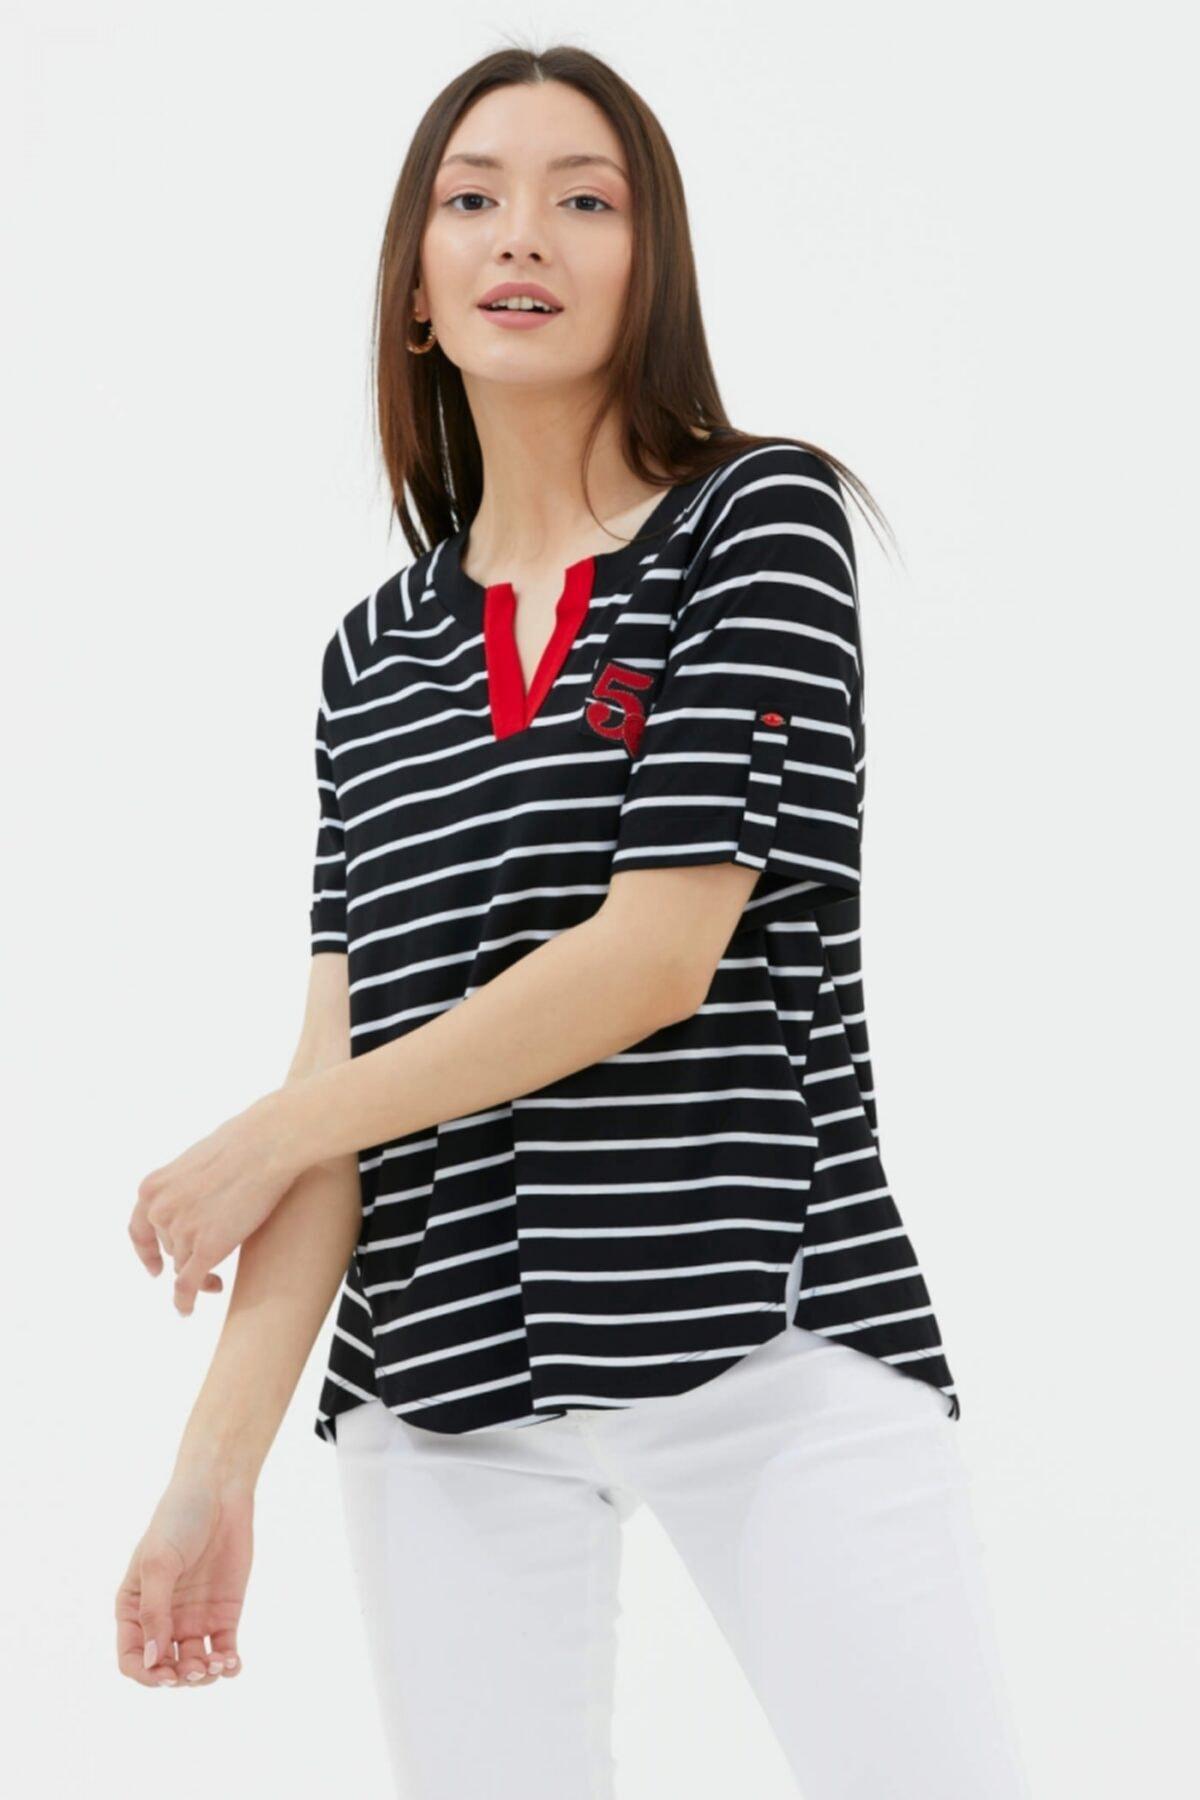 Apolet Kol V Yaka Tshirt - Siyah